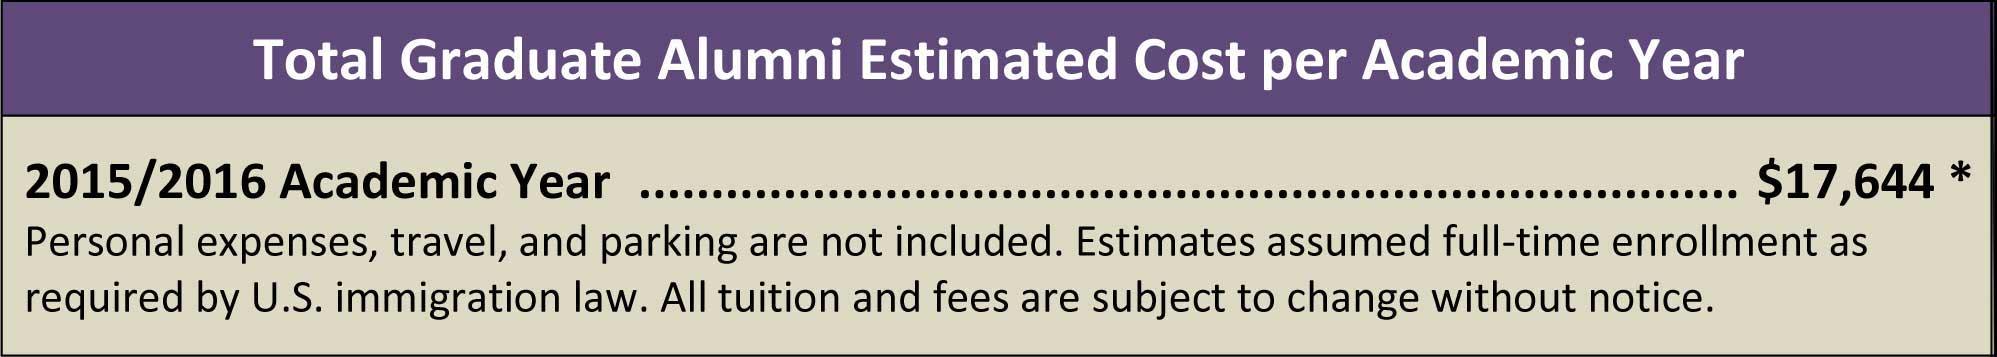 International Students: Total Graduate Alumni Estimated Cost per Academic Year 2015-2016